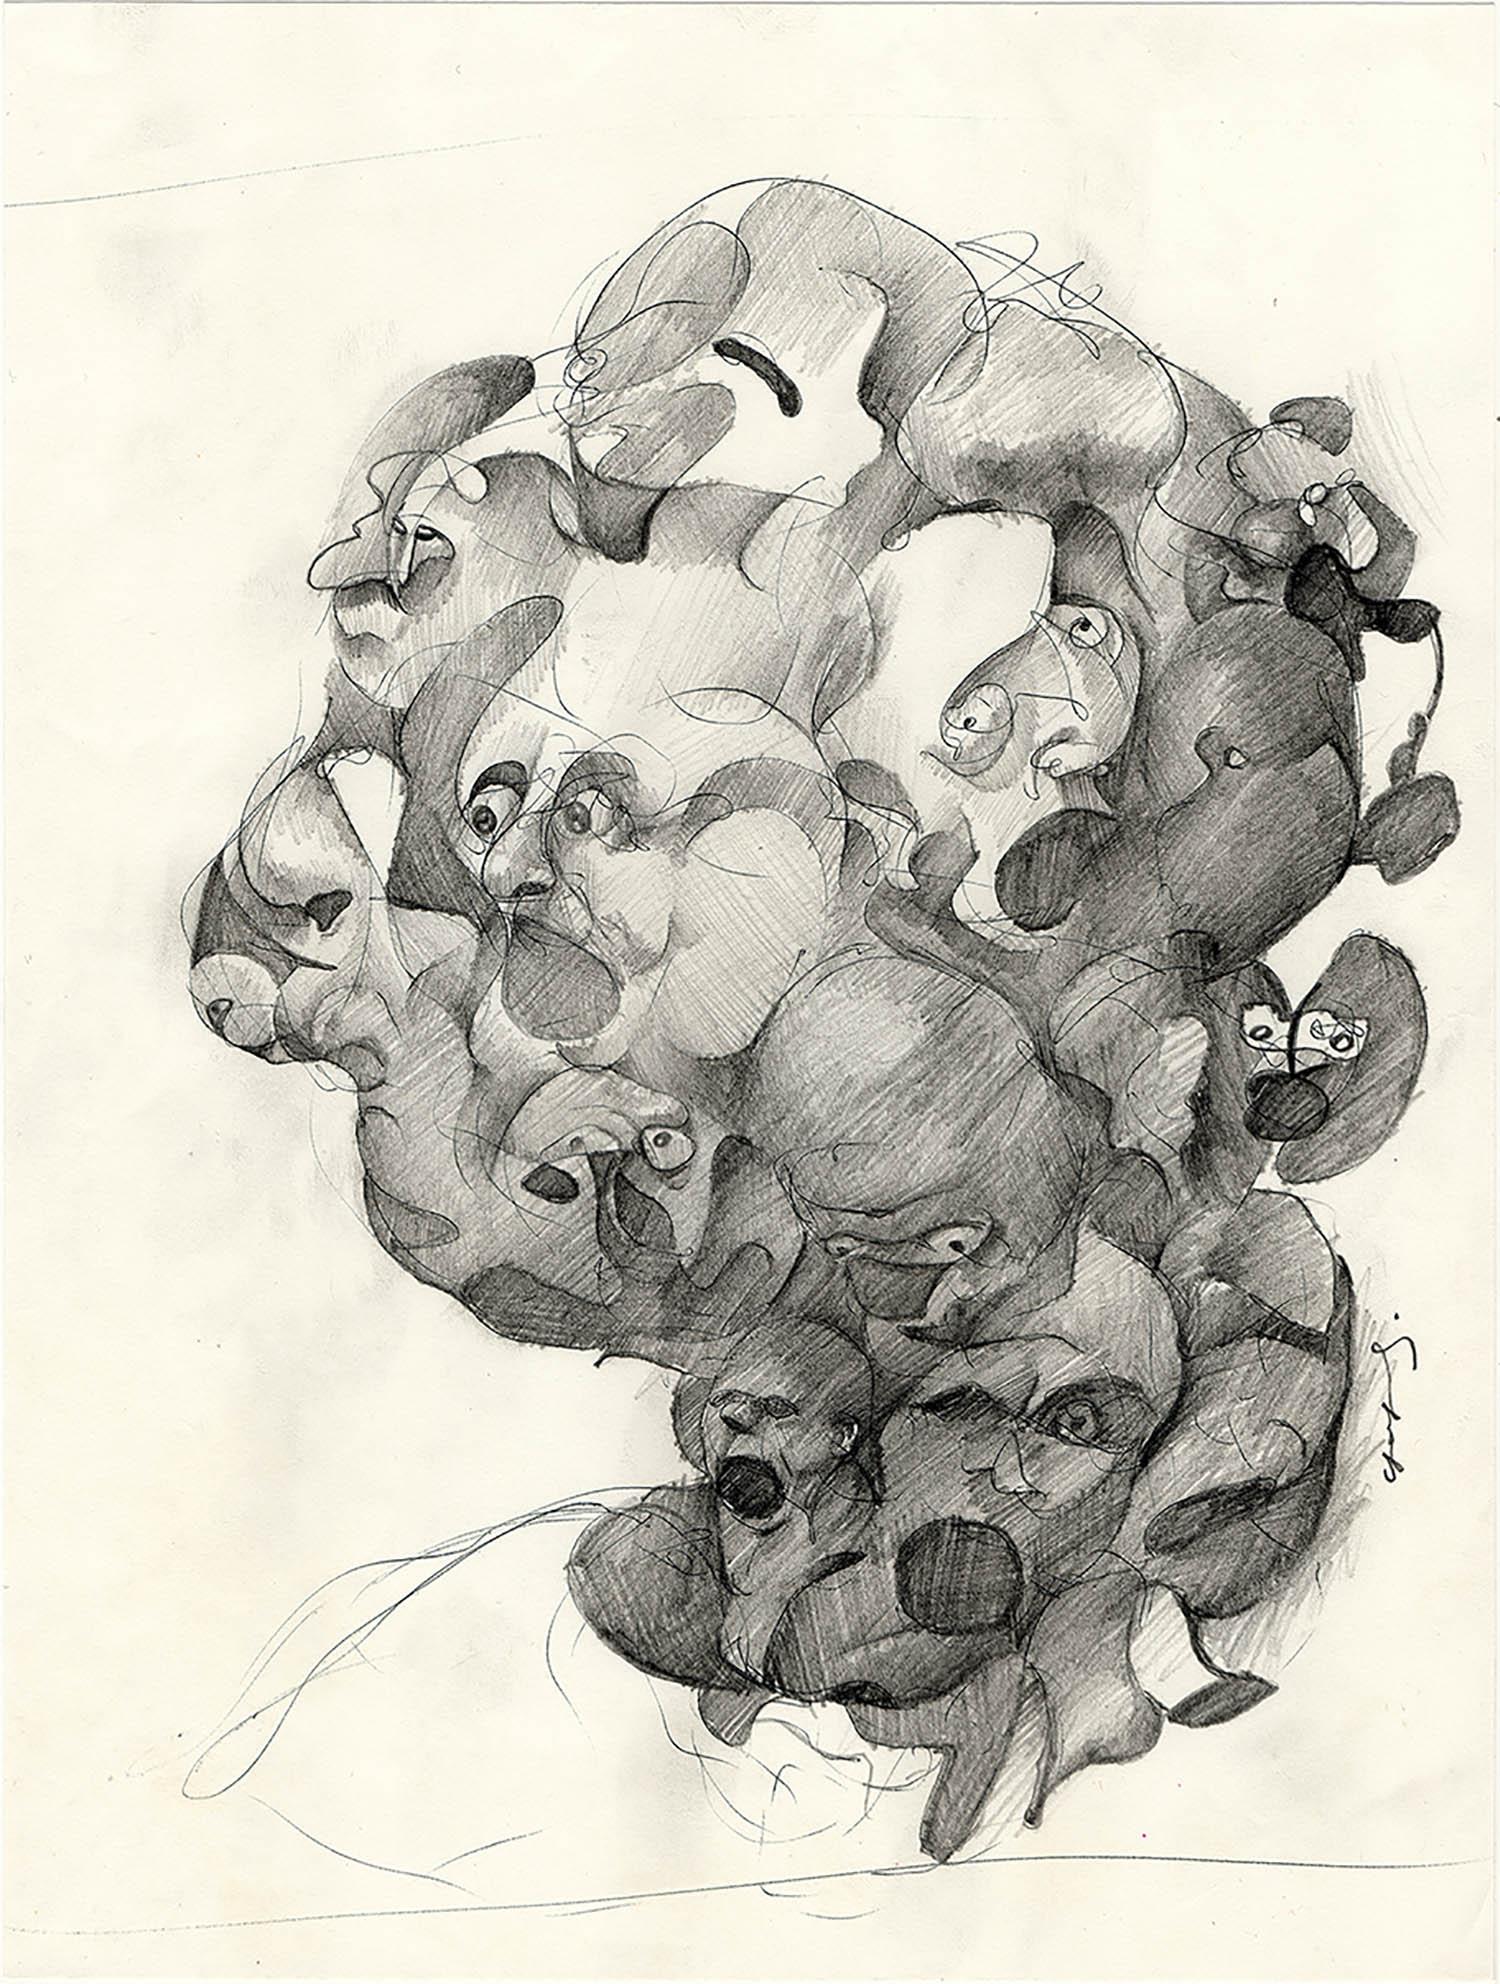 'Headache', An abstract figurative pencil drawing by Greek multidisciplinary artist Kostas Gogas.